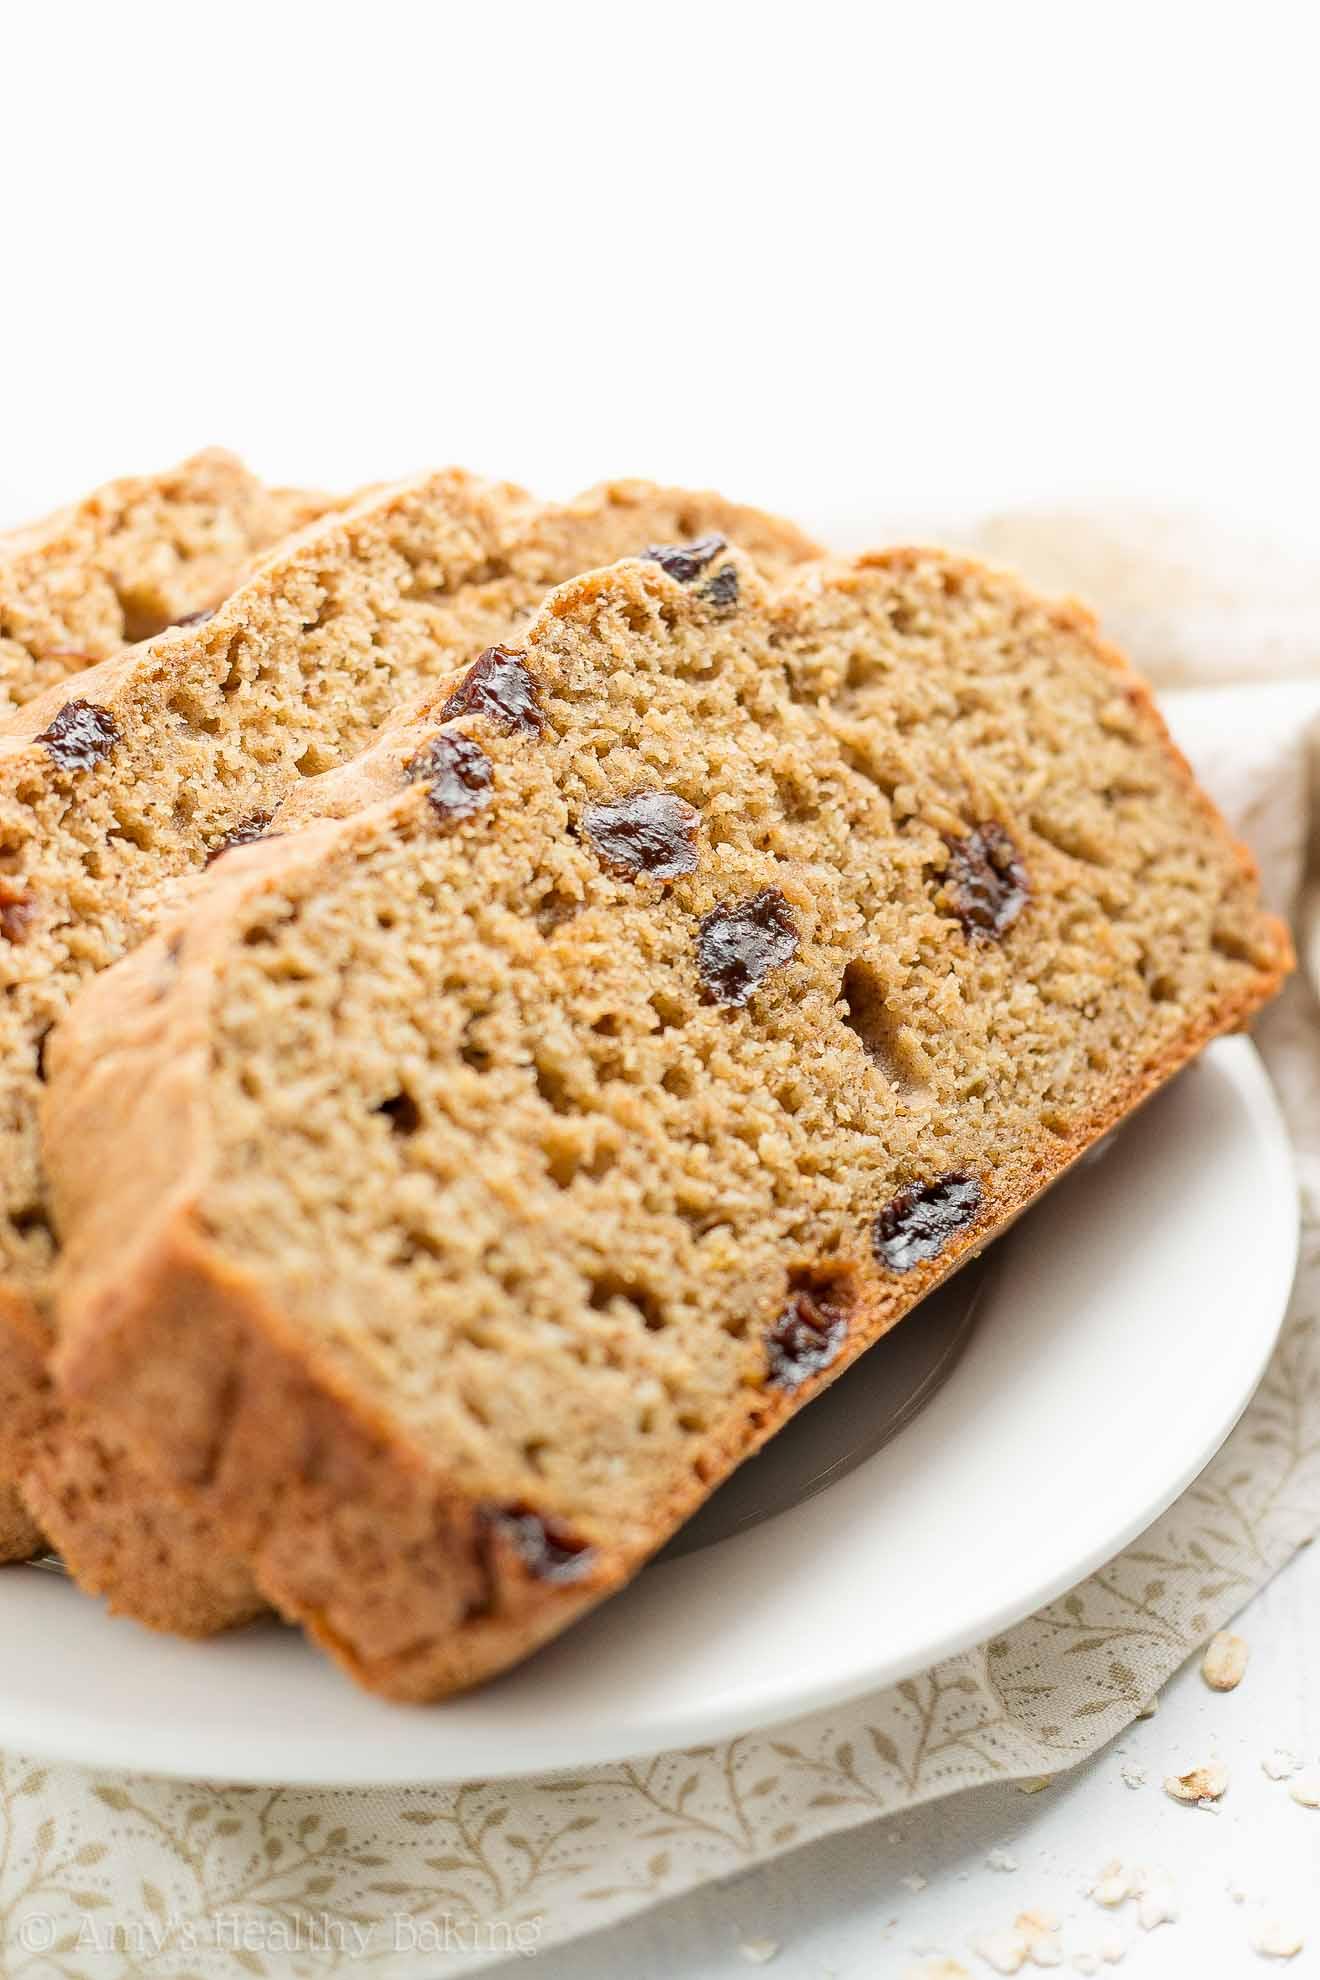 Healthy Oatmeal Raisin Breakfast Quick Bread | Amy's Healthy Baking